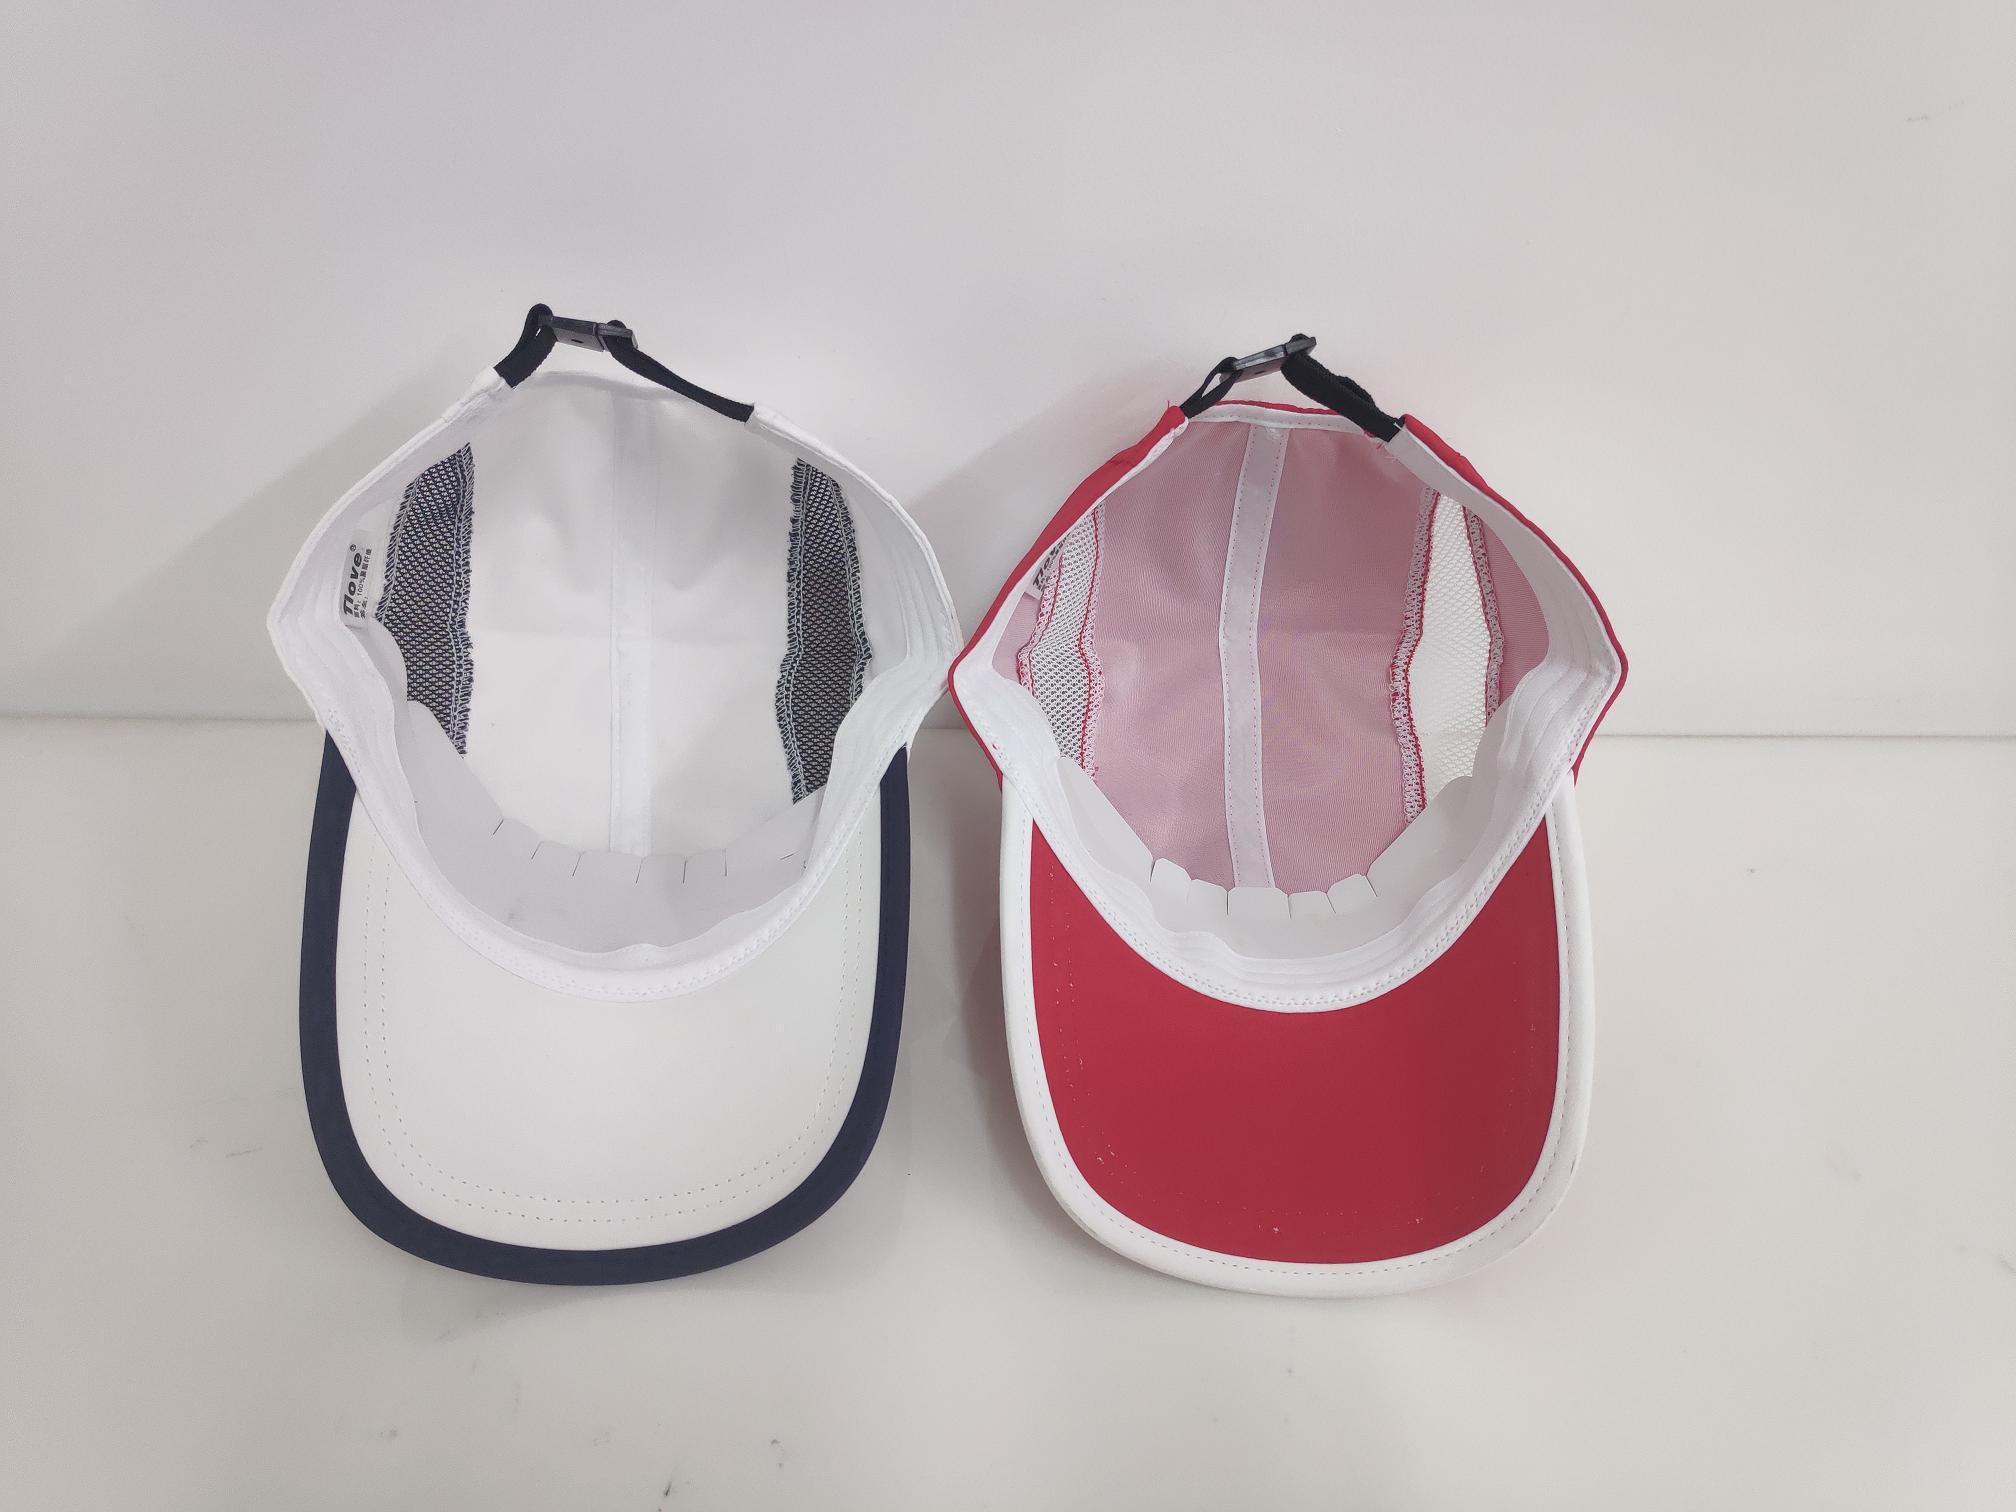 Polyester Micro fiber Jockey 6panel Gorras baseball cap 4